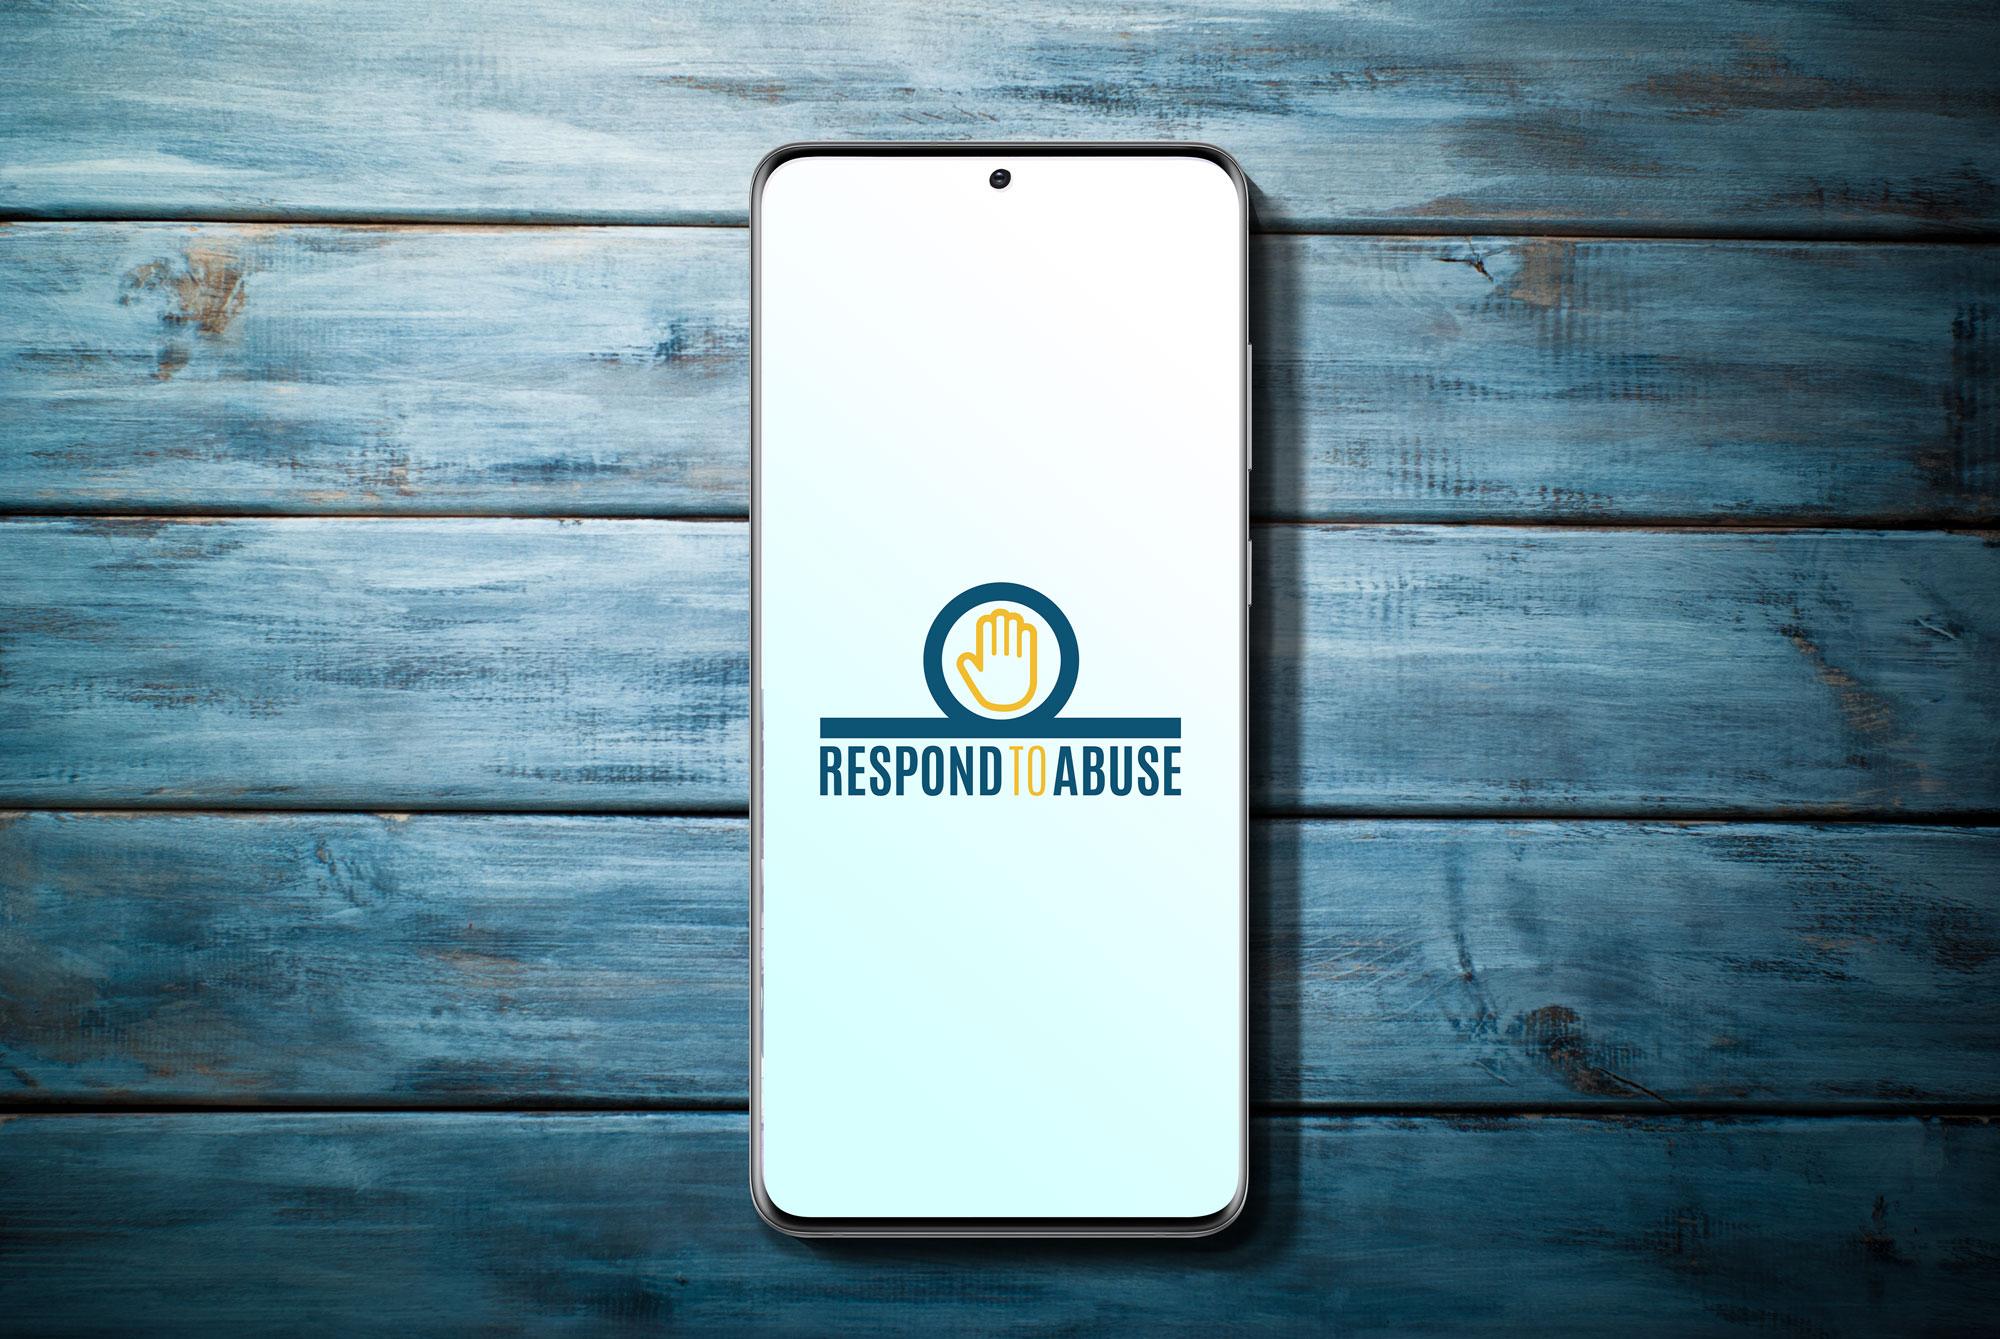 Hestia respond to abuse logo design on a phone screen